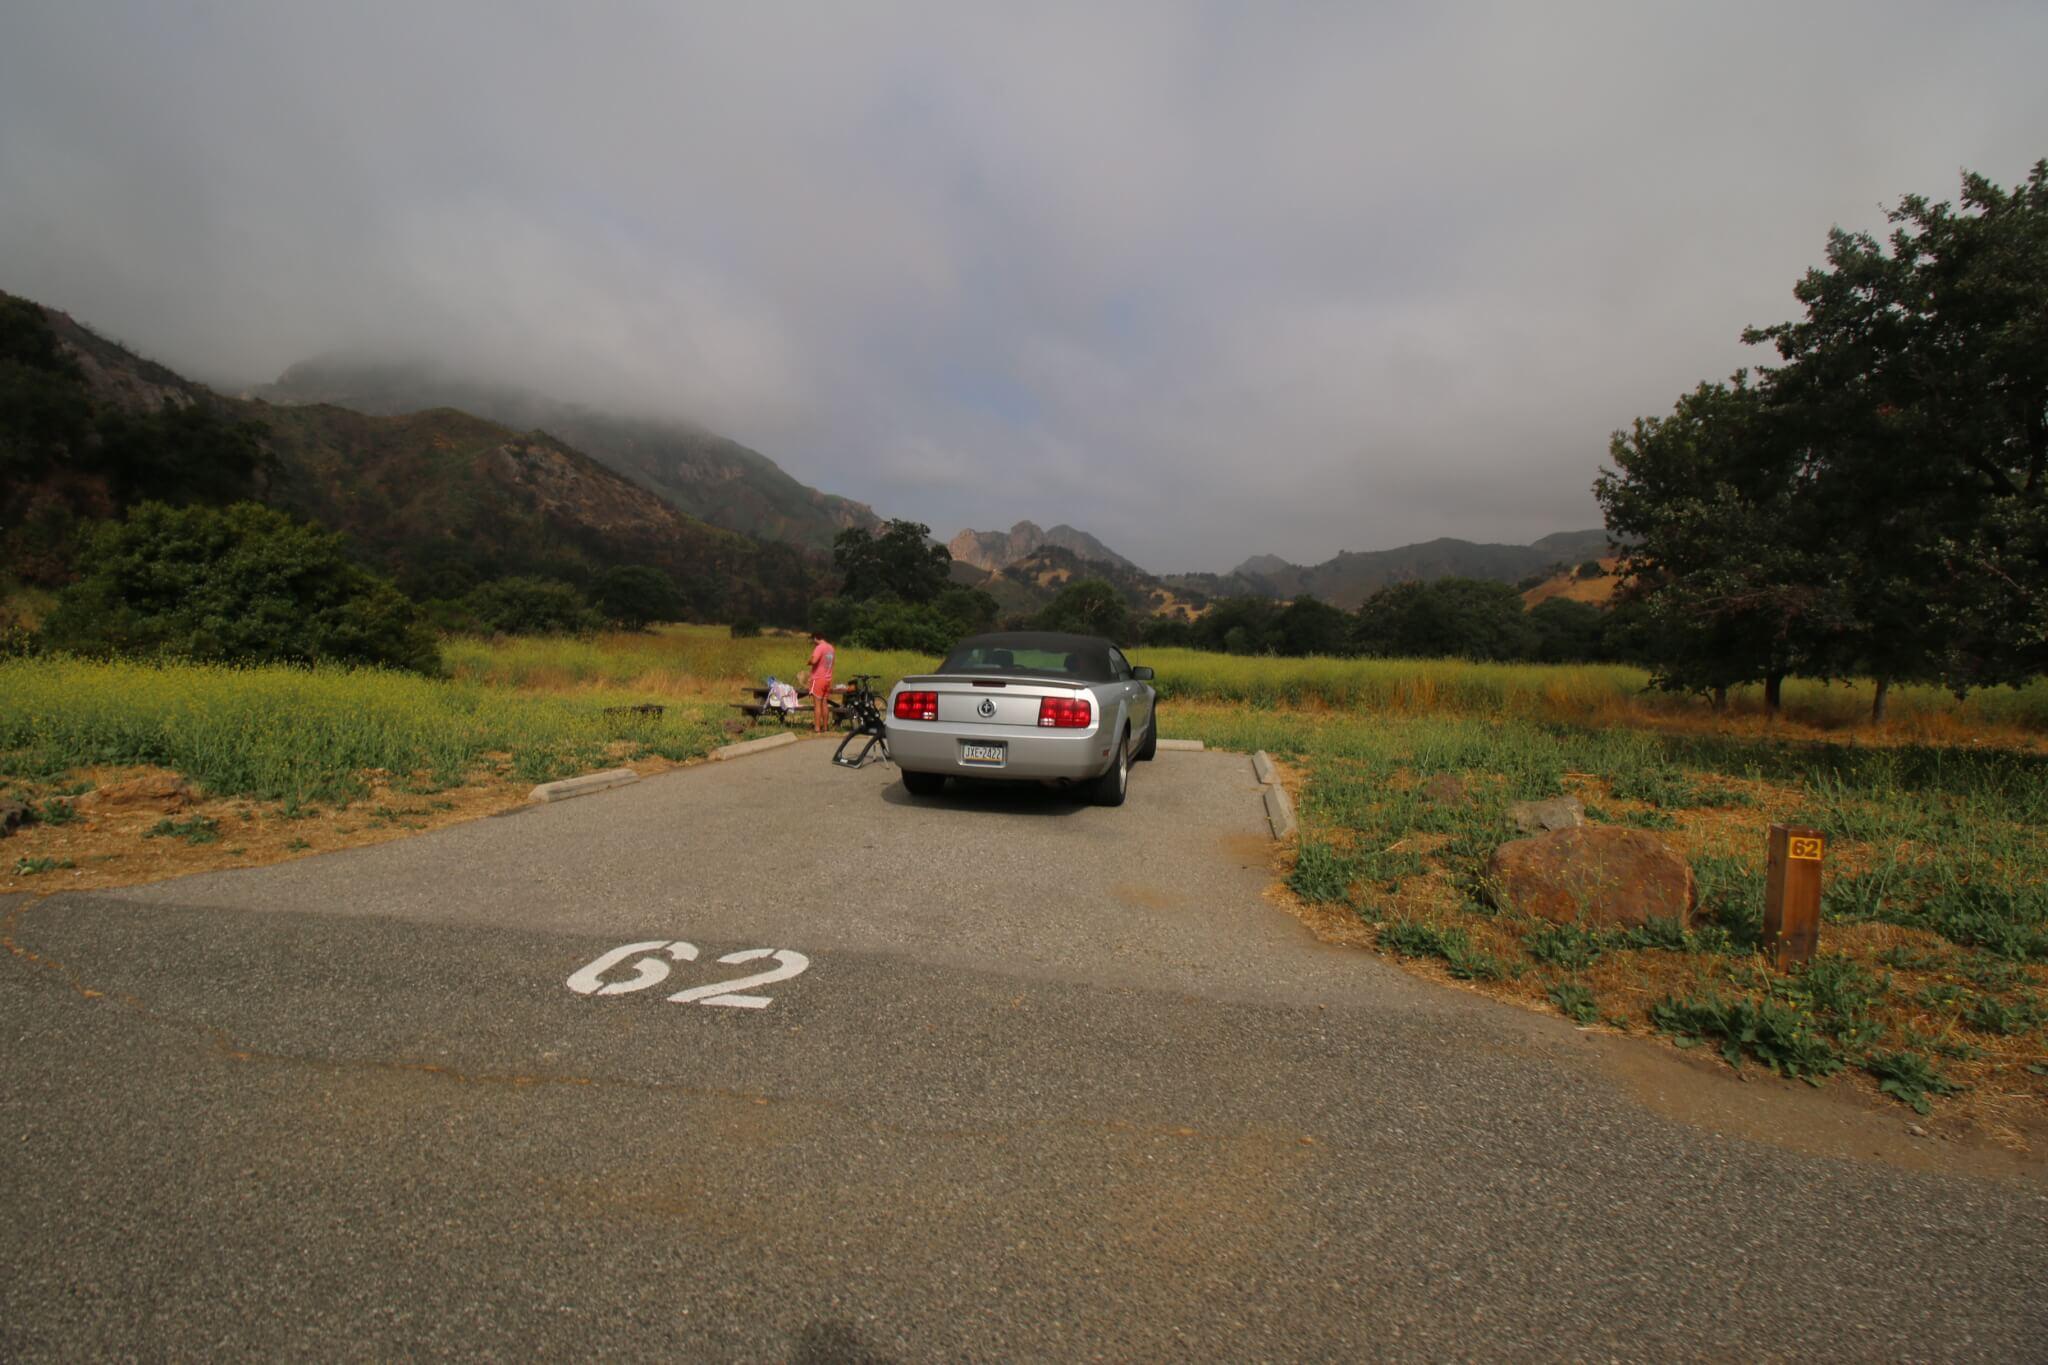 Malibu Creek State Park Campsite #62